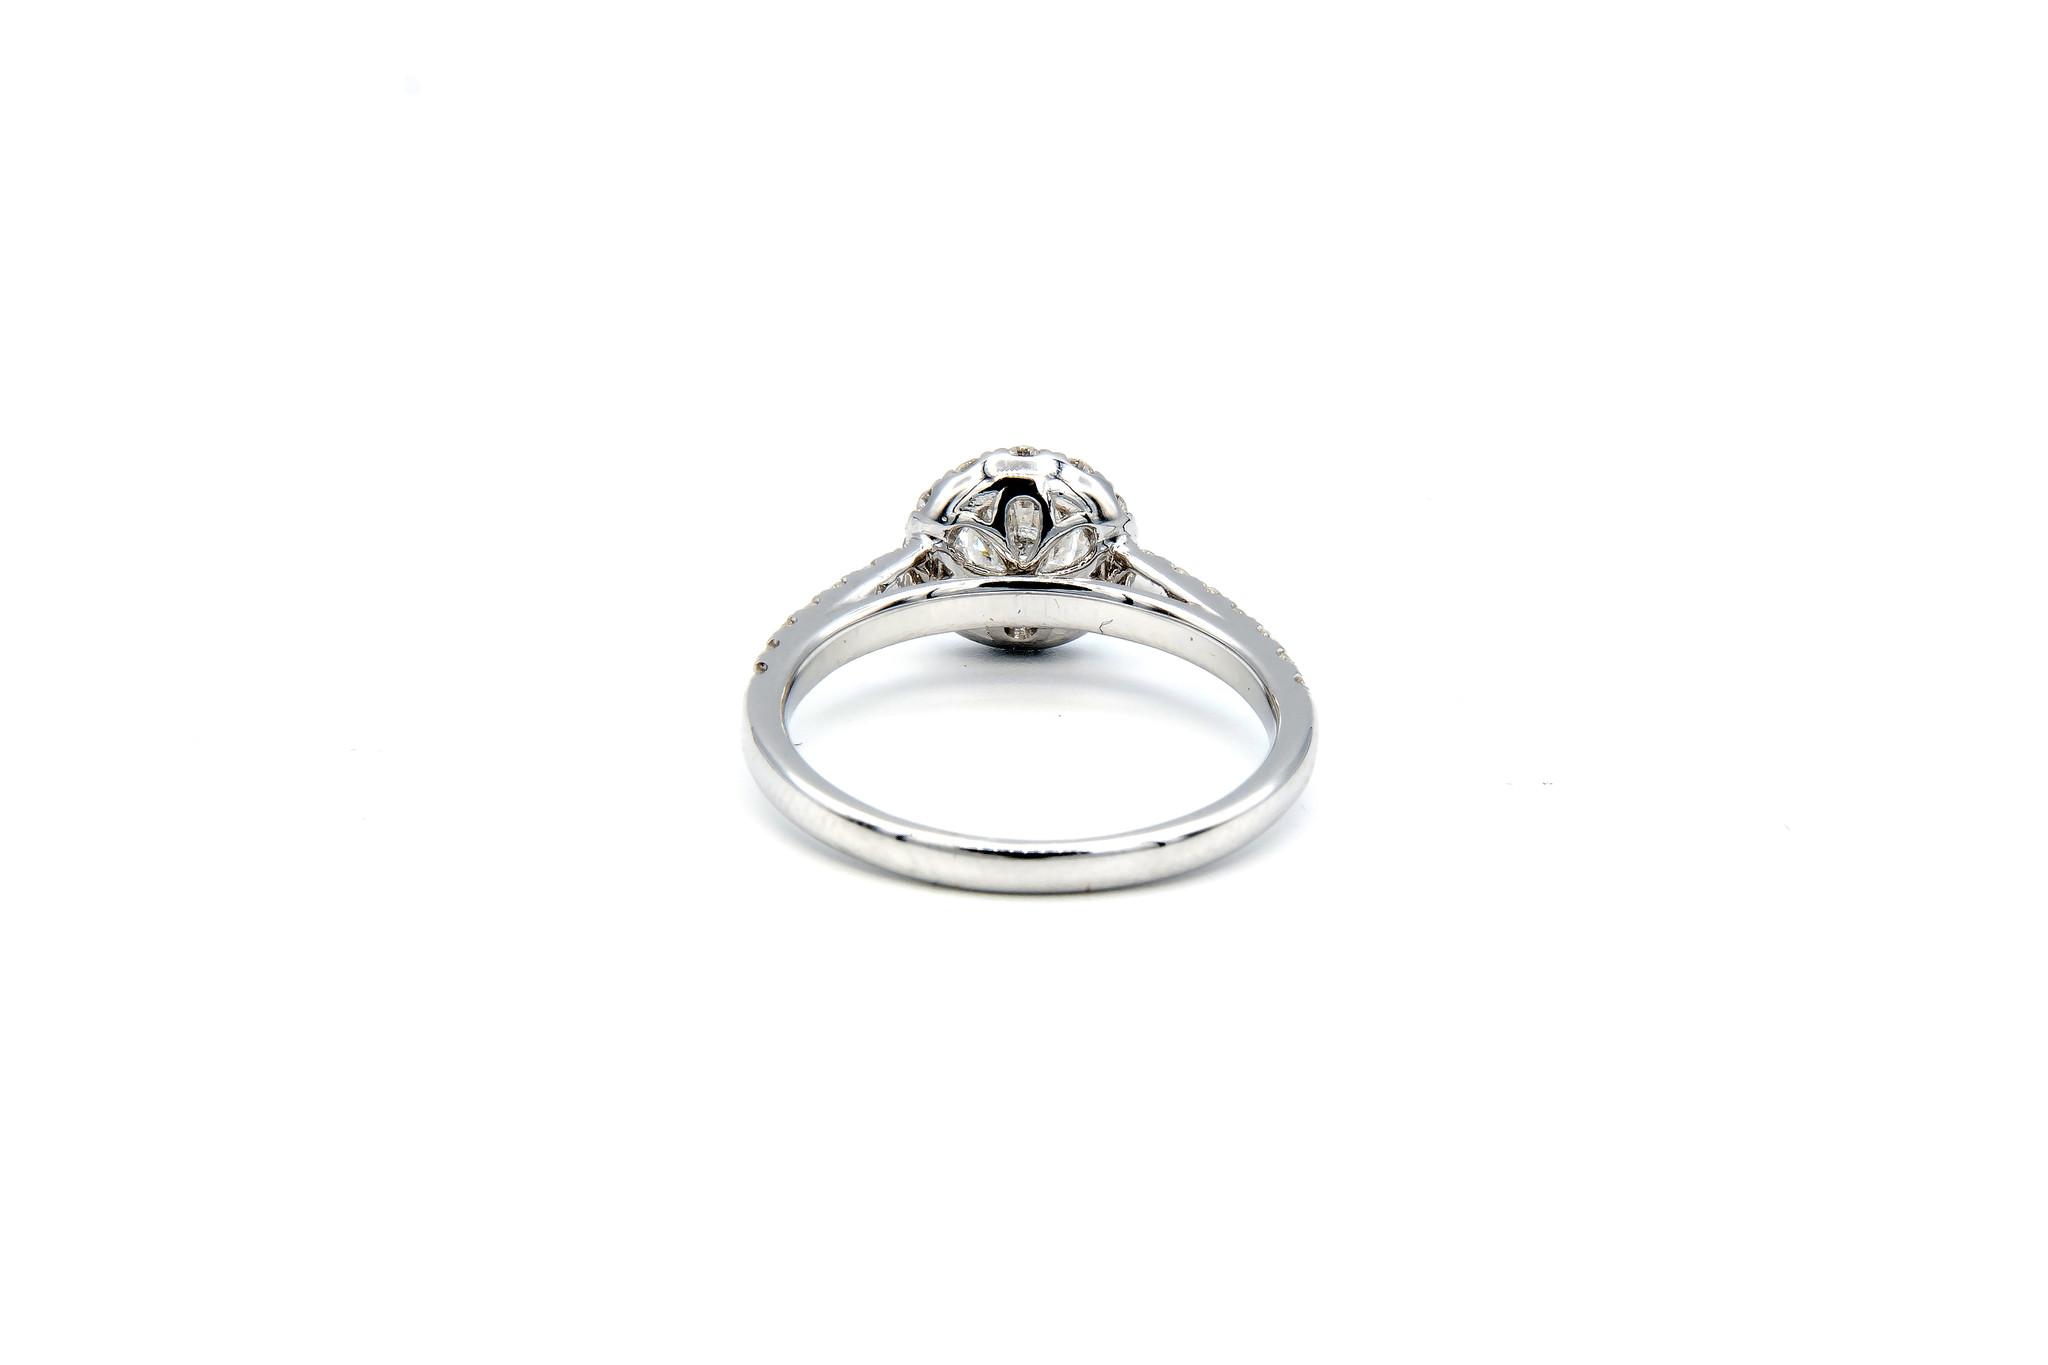 Ring verlovingsring witgoud met 0,5 ct SI en 0,59 ct VS diamant-2